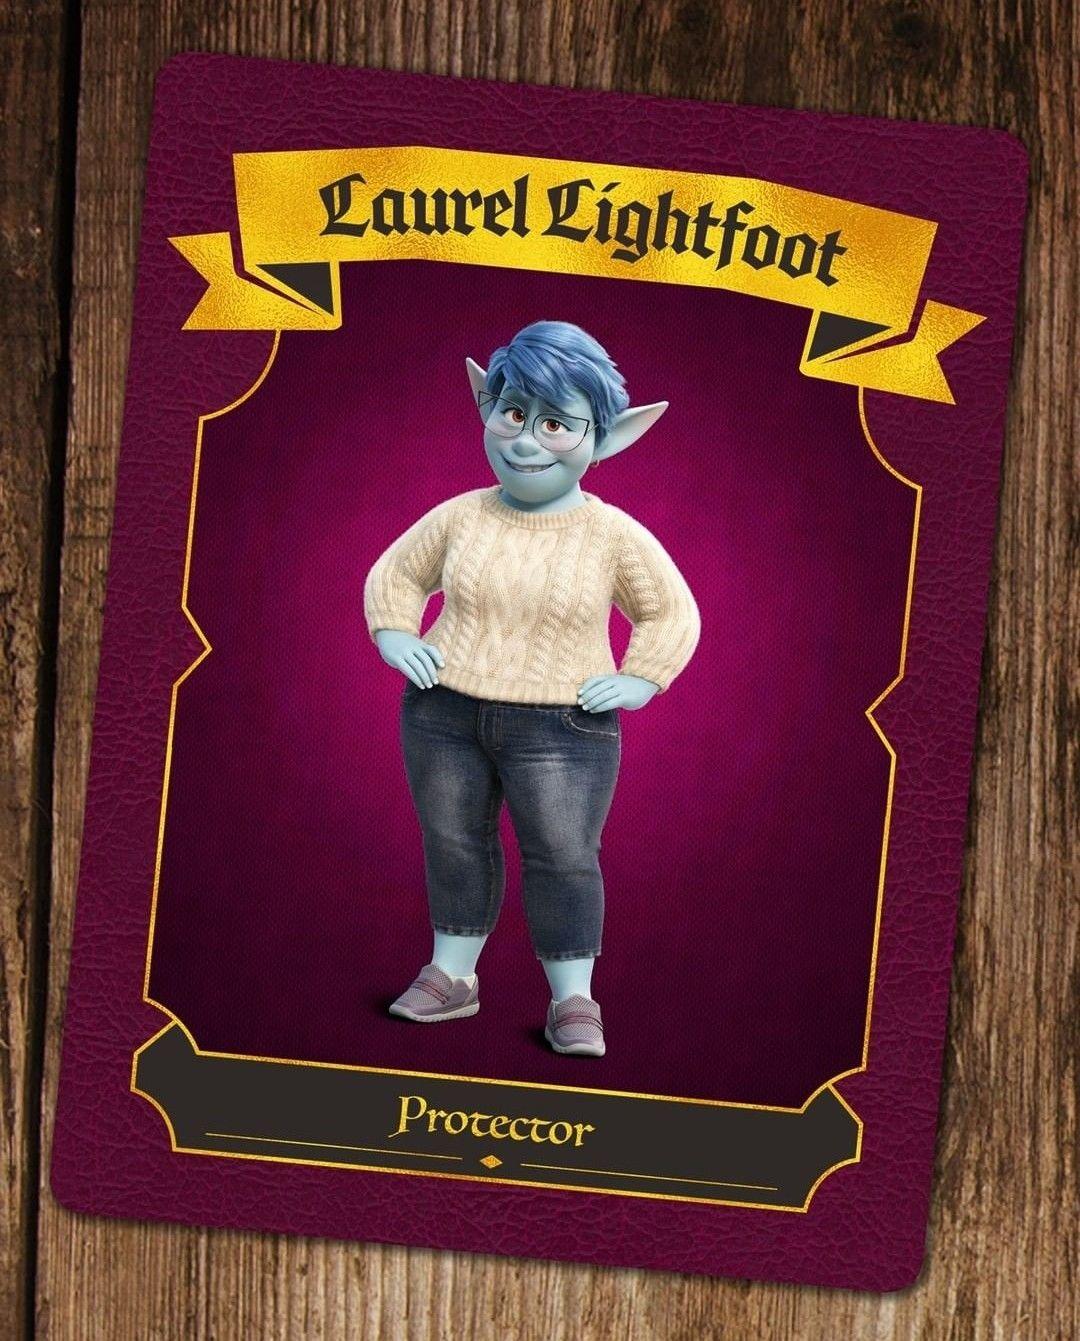 Lightfoot image by Disney Lovers! on Onward in 2020